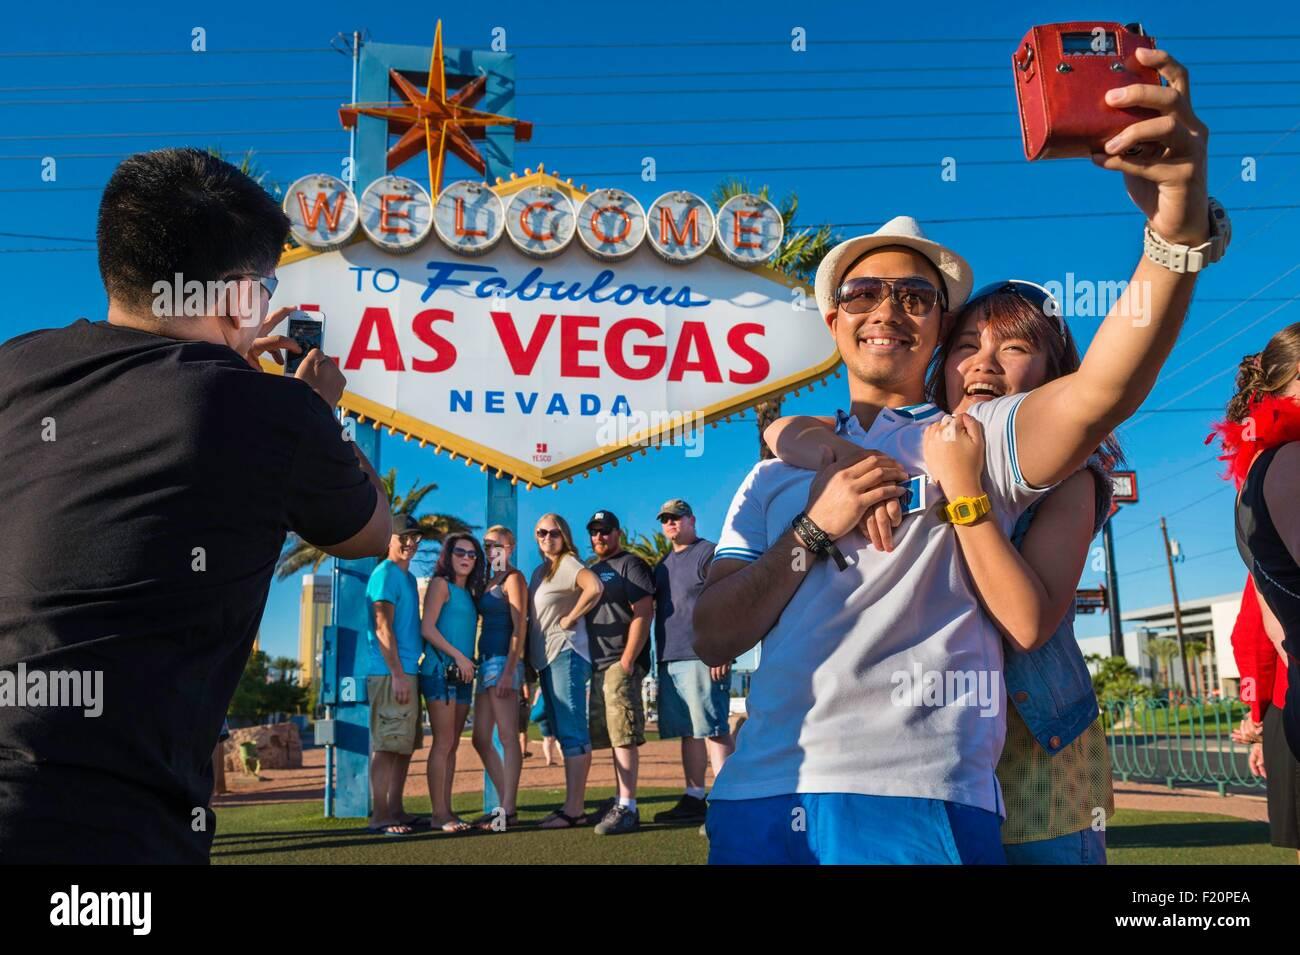 United States, Nevada, the Strip, Las Vegas sign on Las Vegas Boulevard - Stock Image